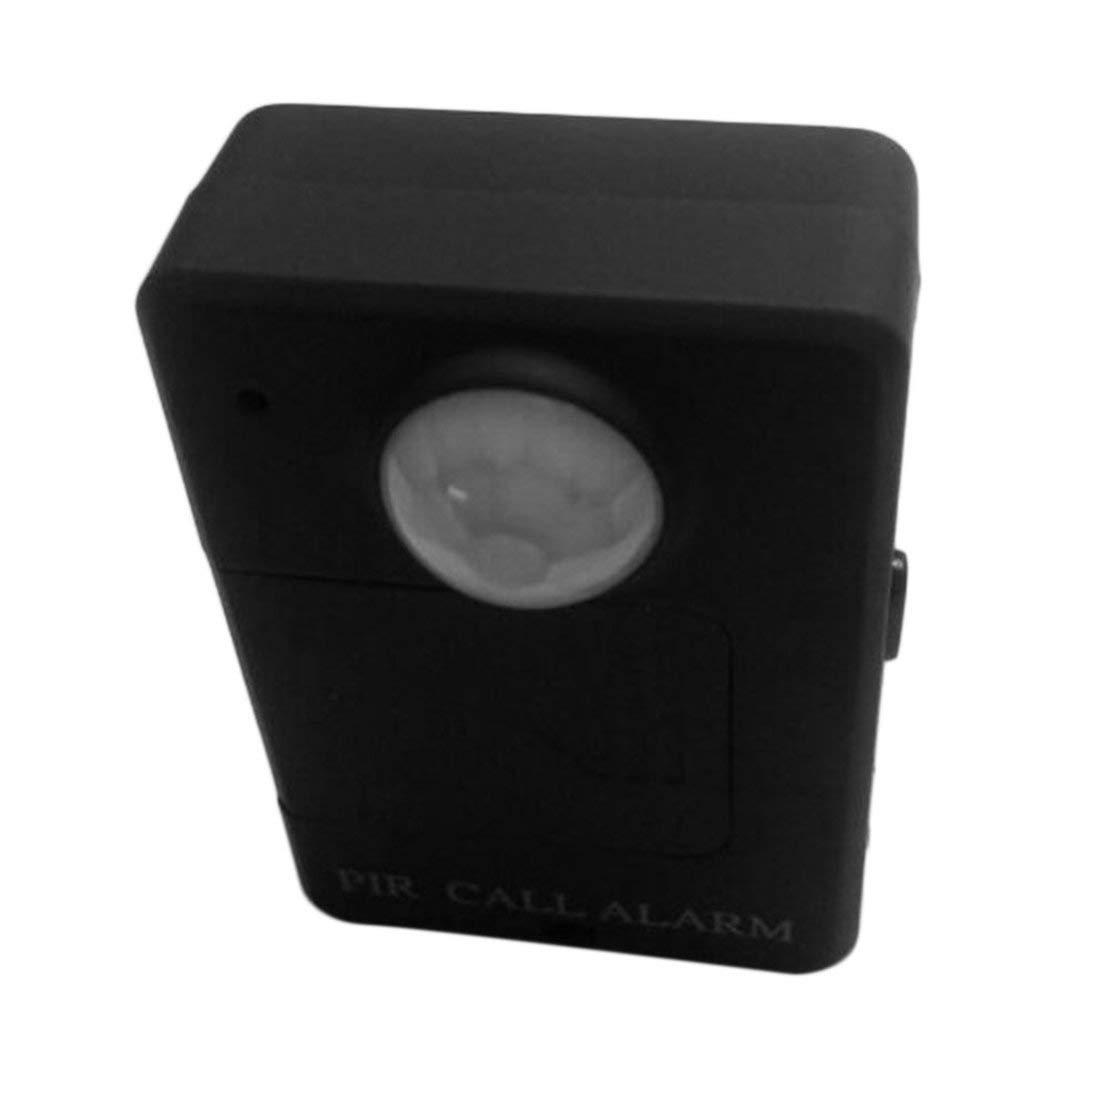 Mini PIR Alert Sensor Infrared GSM Wireless Alarm Monitor Motion Detection Hot Selling Anti-theft Motion Detector Wireless